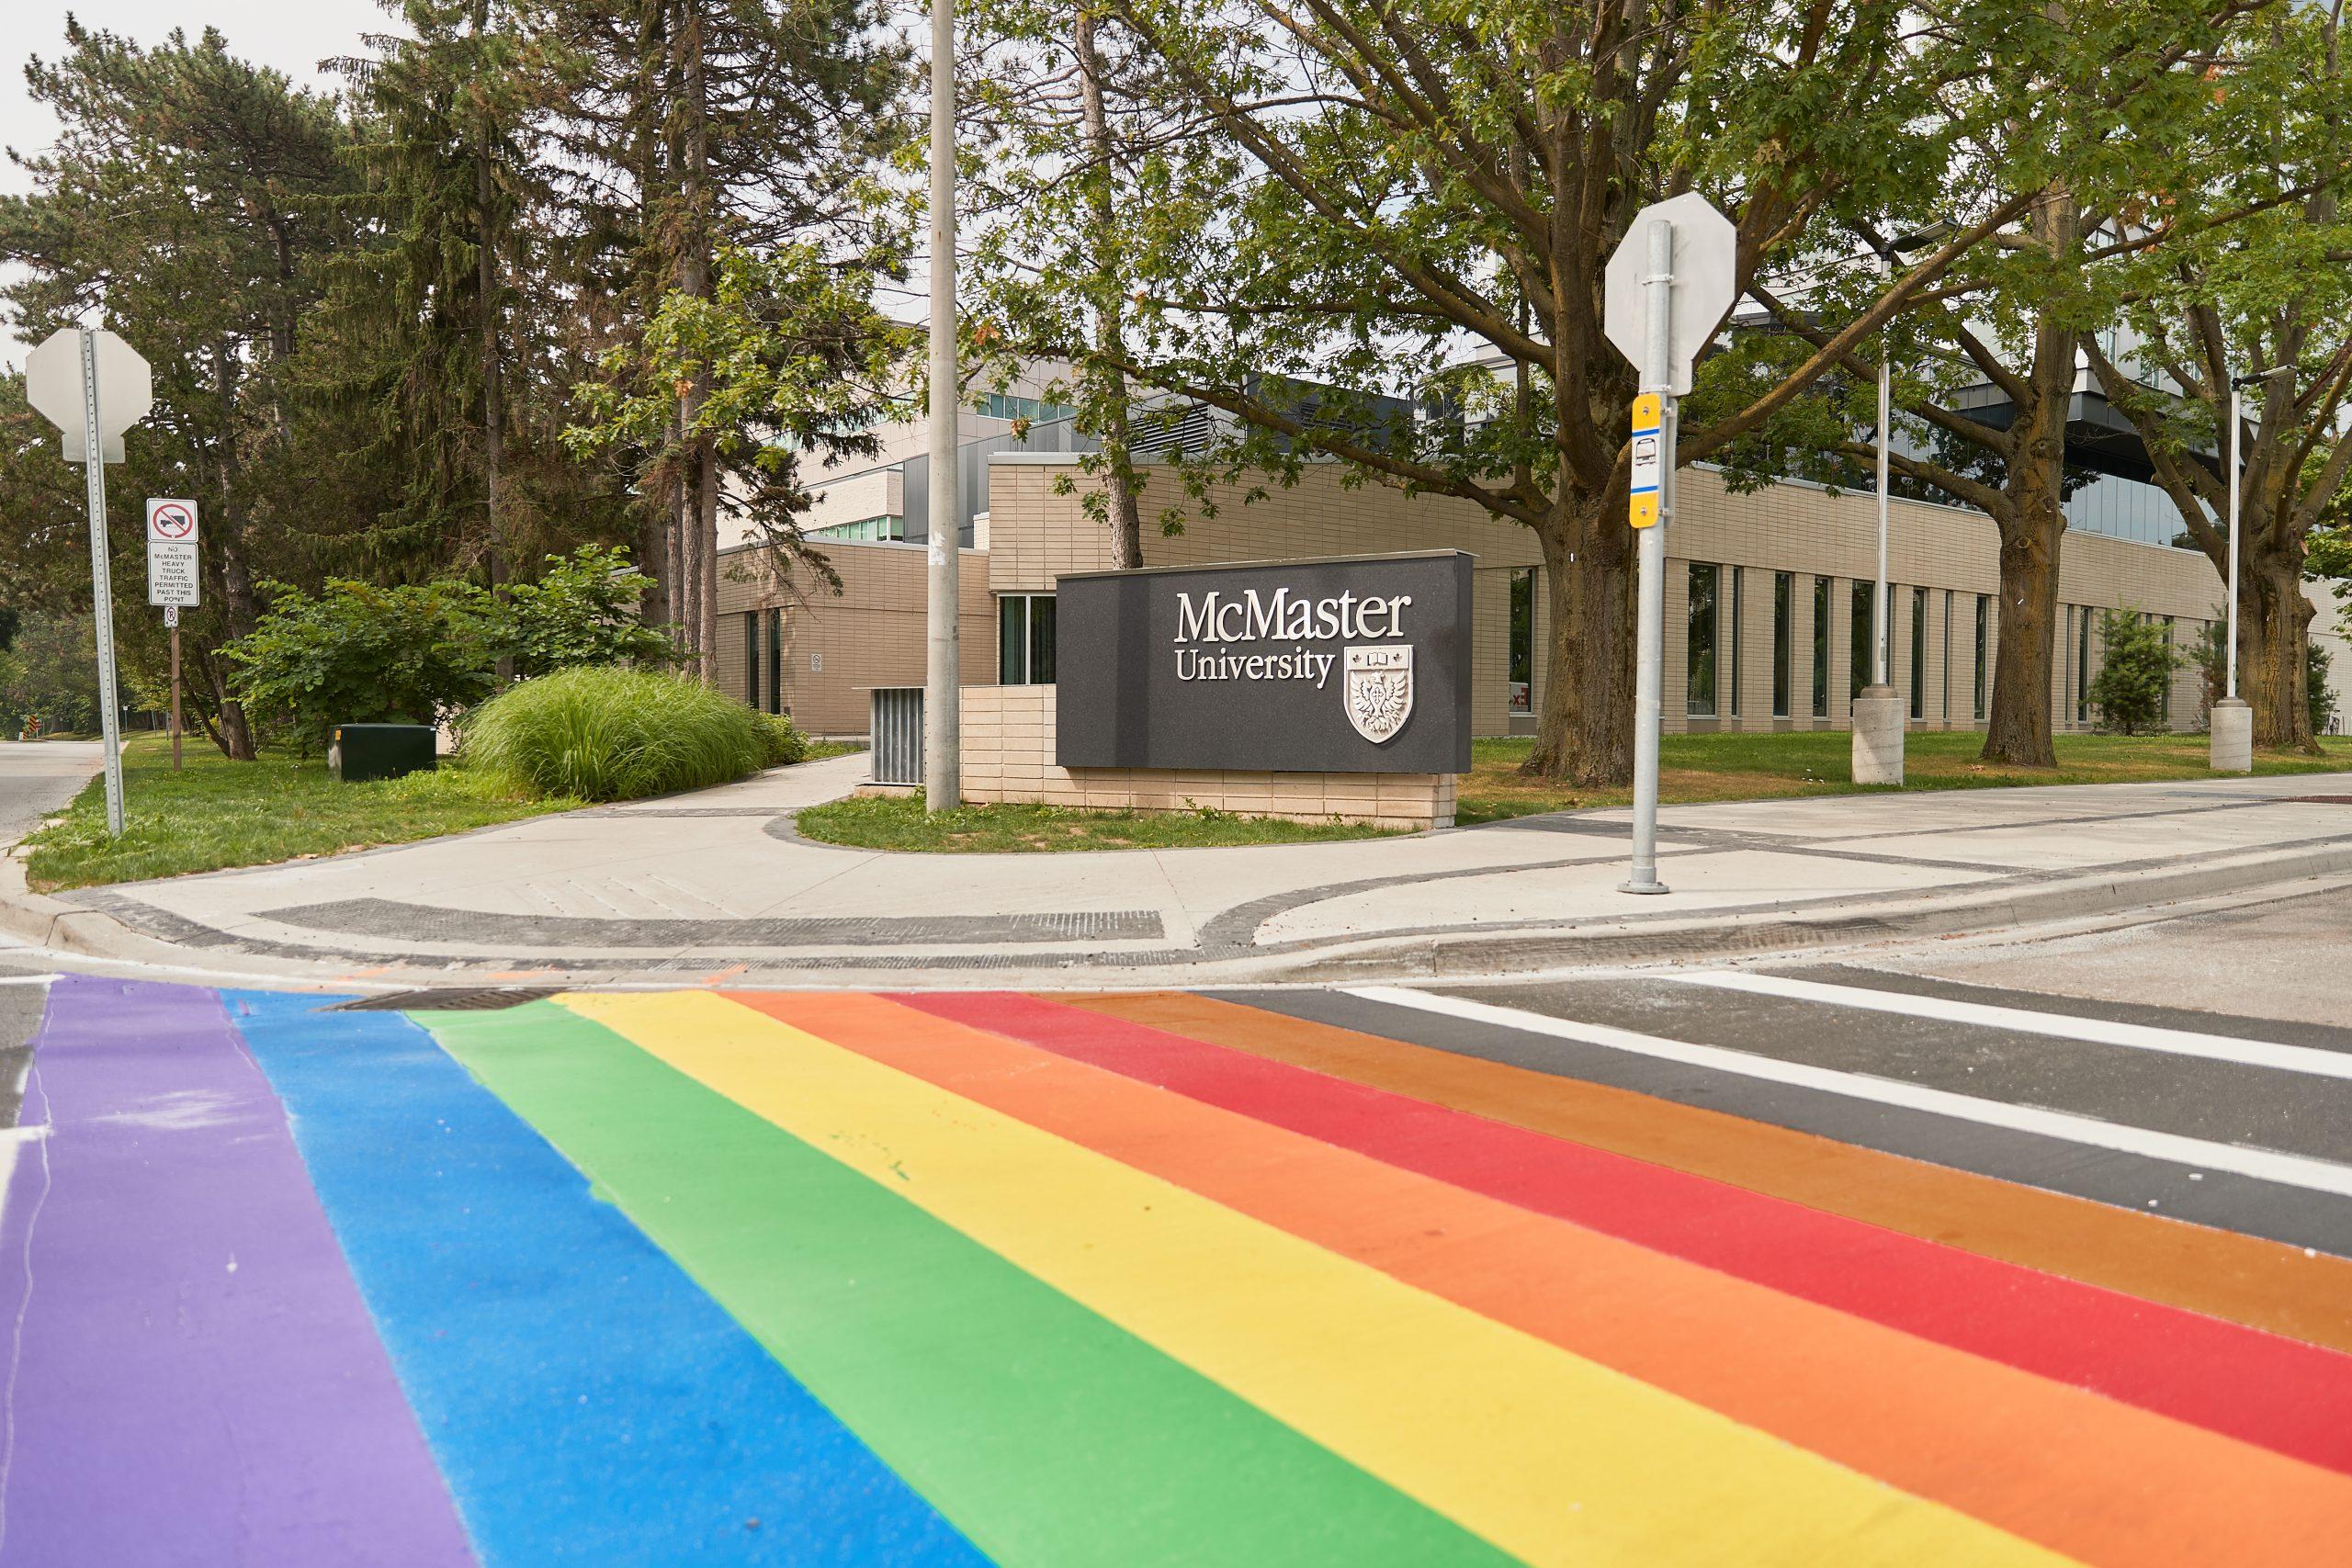 McMaster University Sterling Entrance